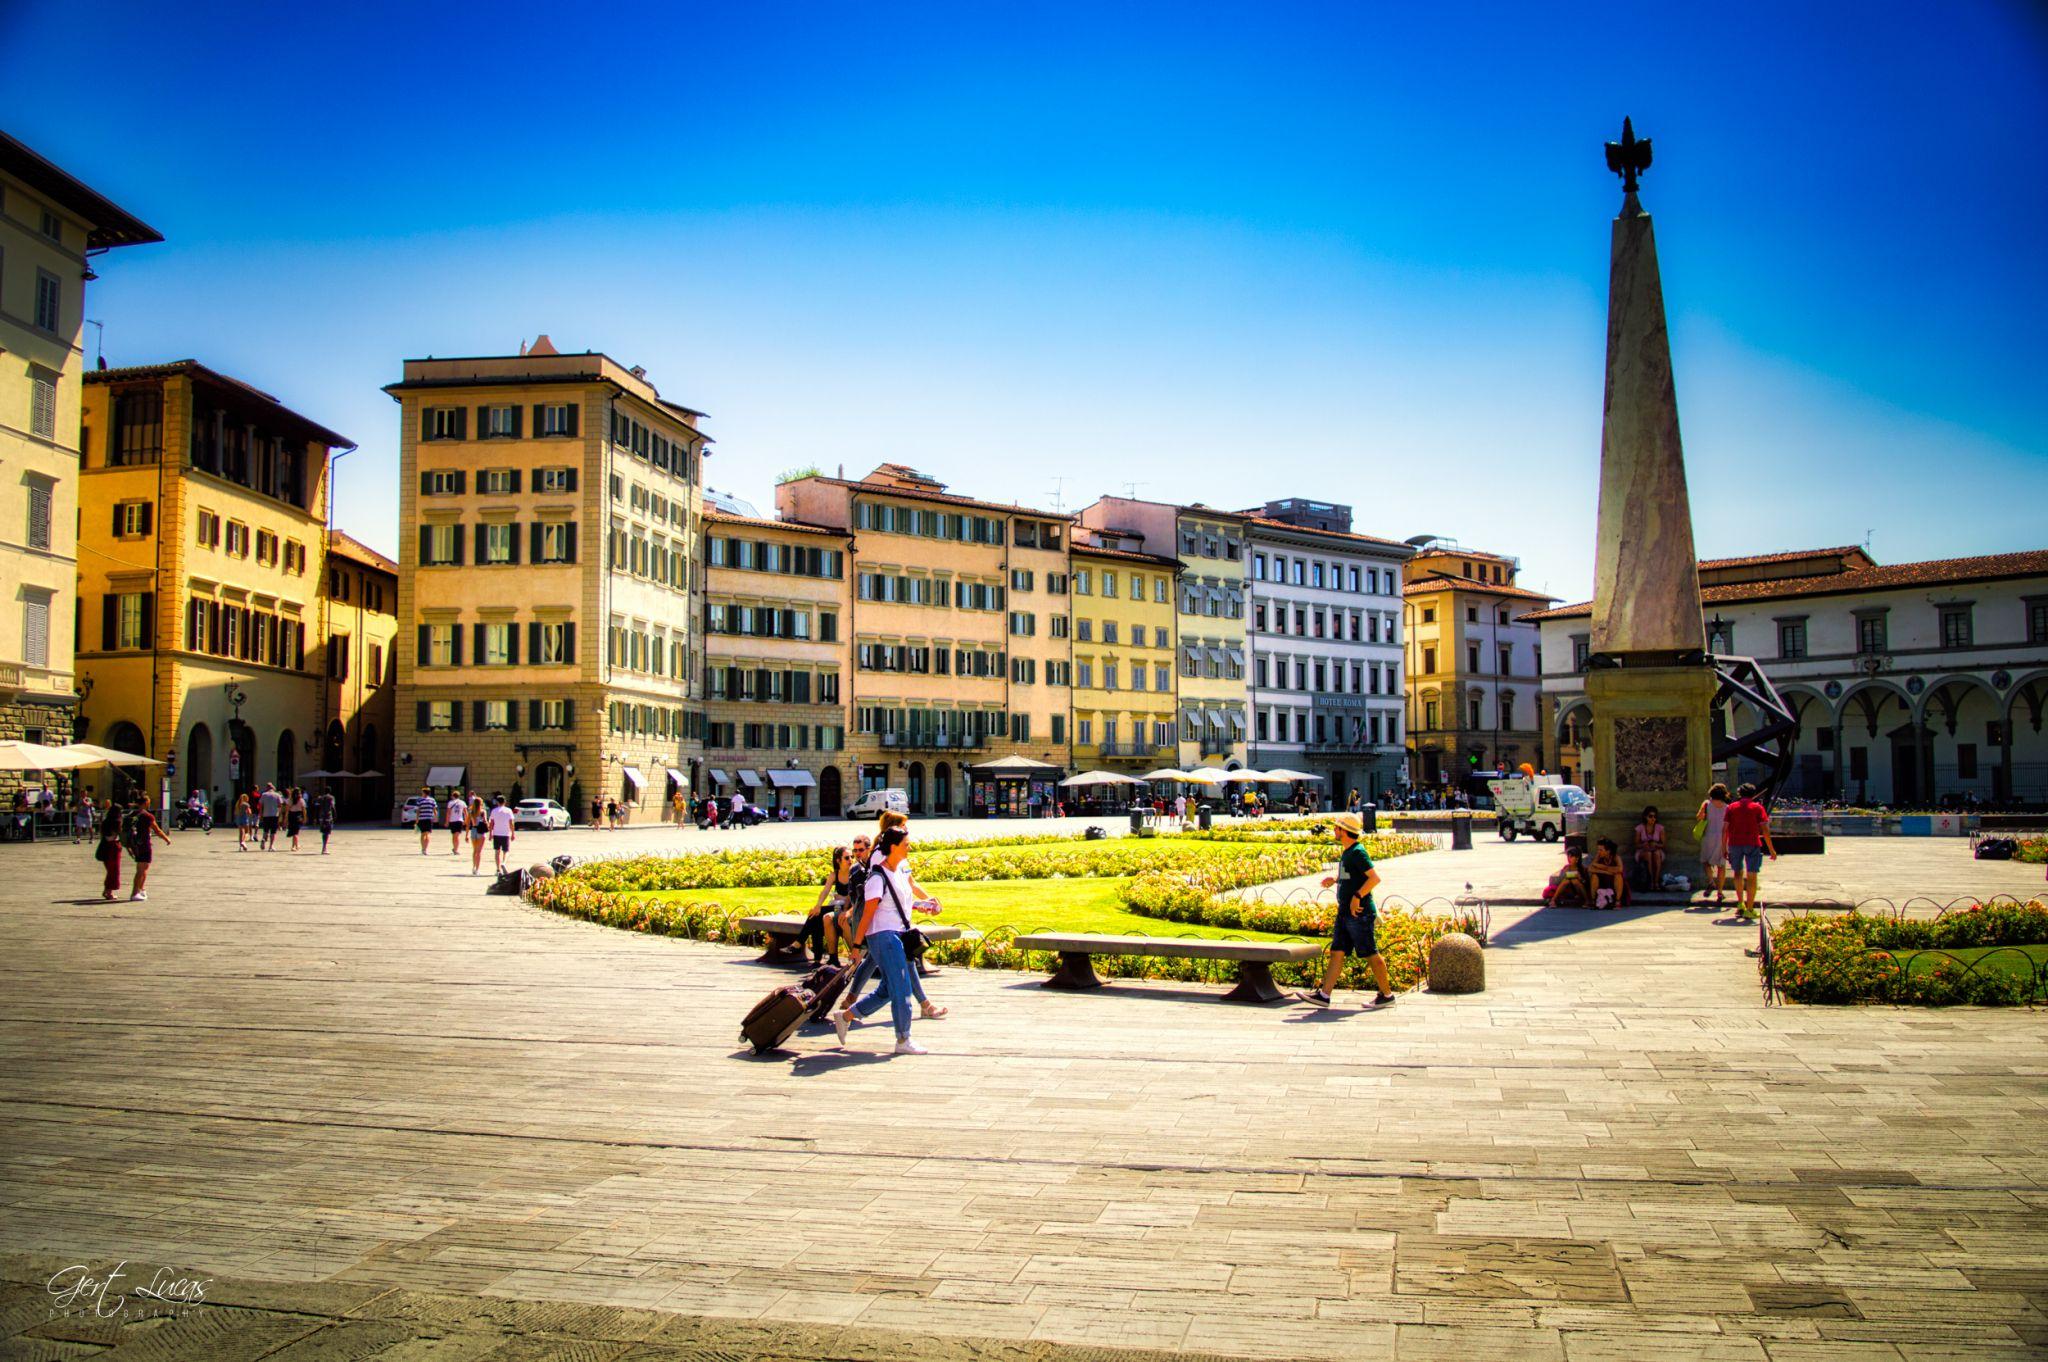 Piazza Di Santa Maria Novella, Italy